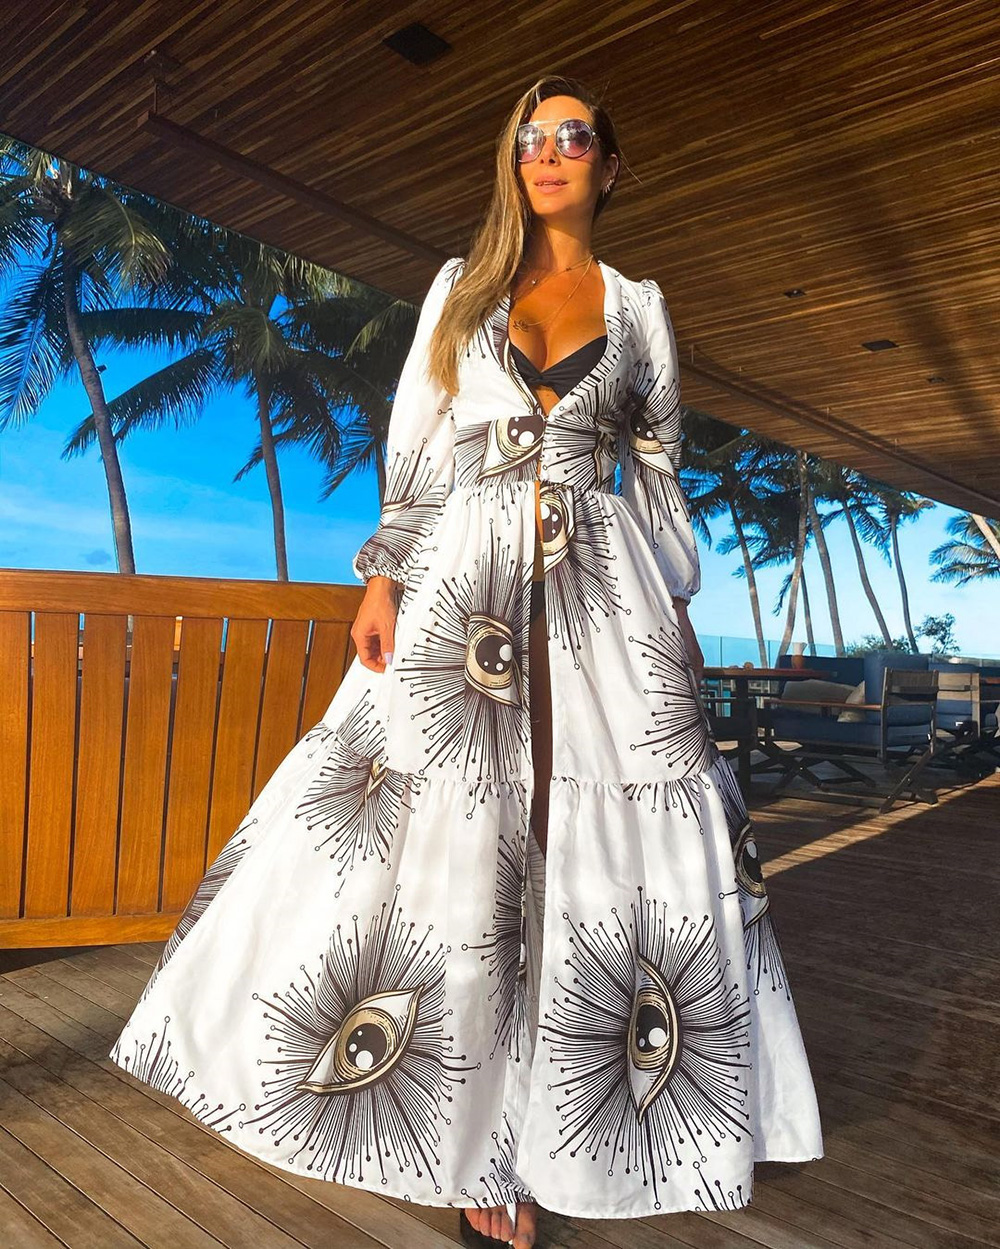 Crochet White Knitted Beach Cover up dress Tunic Long Pareos Bikinis Cover ups Swim Cover up Robe Plage Beachwear 9